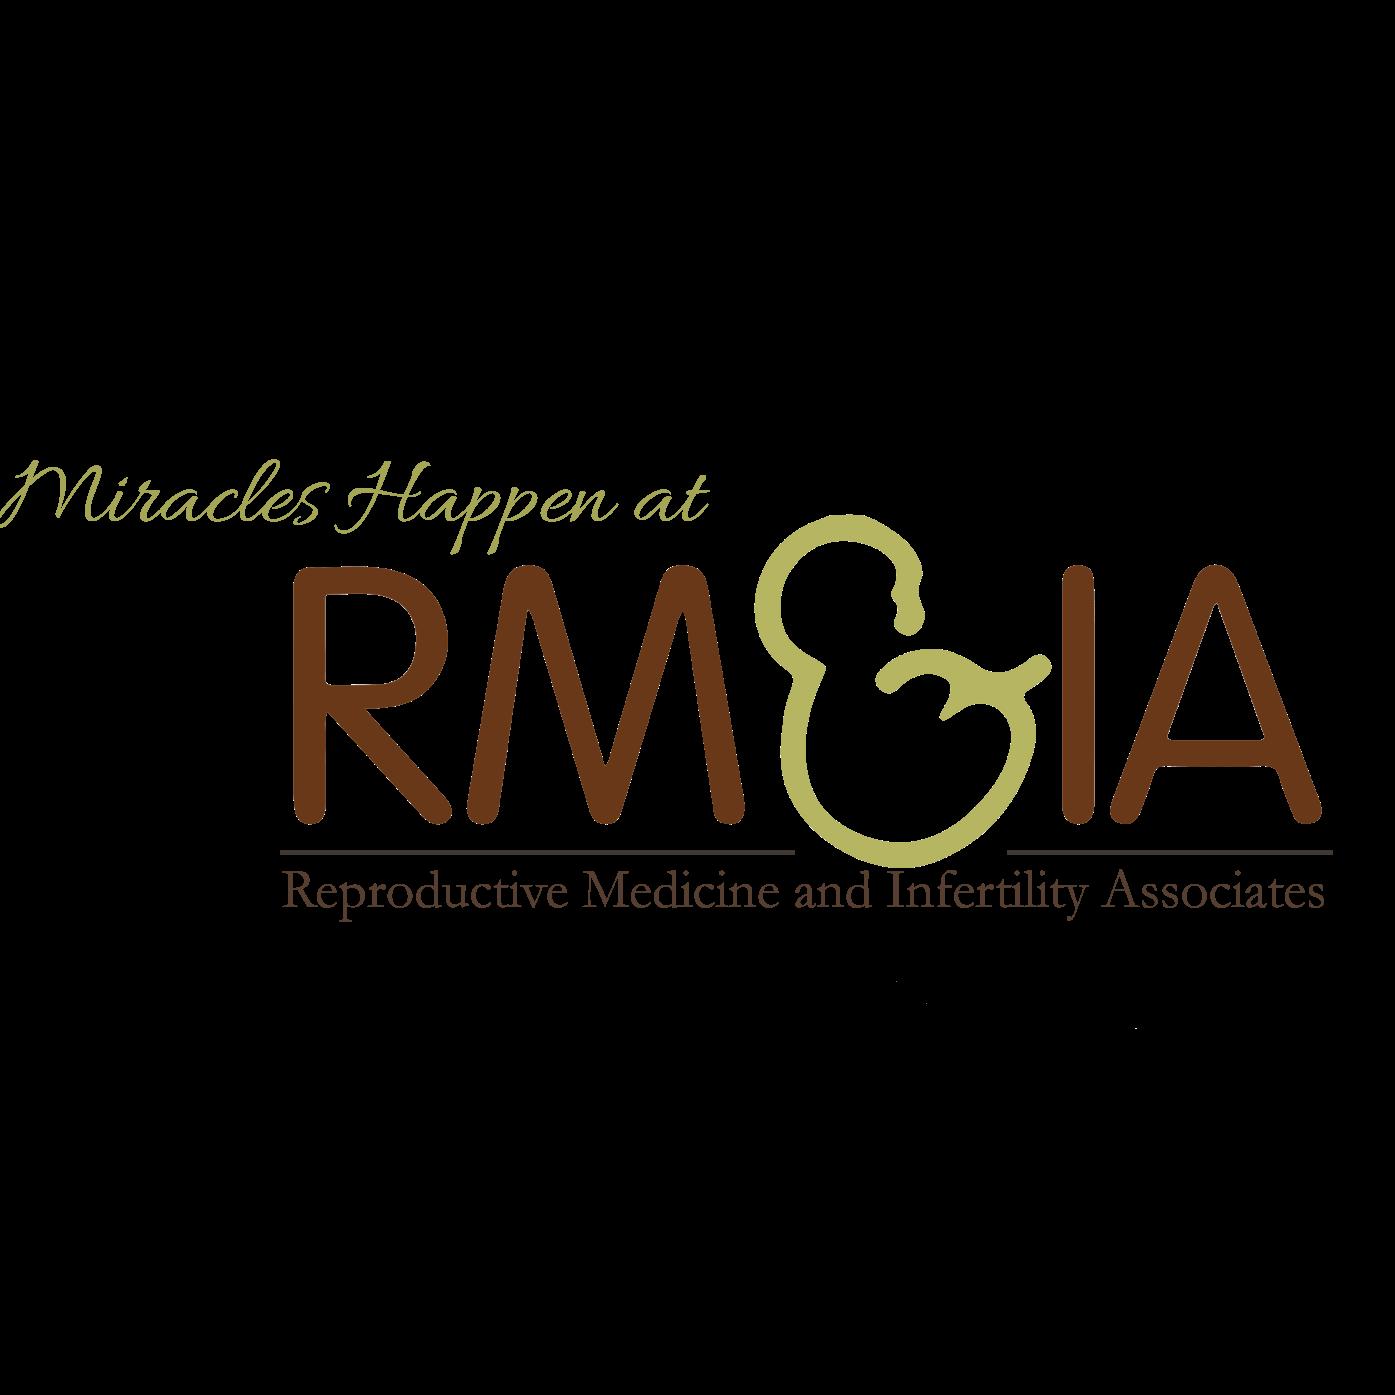 Reproductive Medicine and Infertility Associates